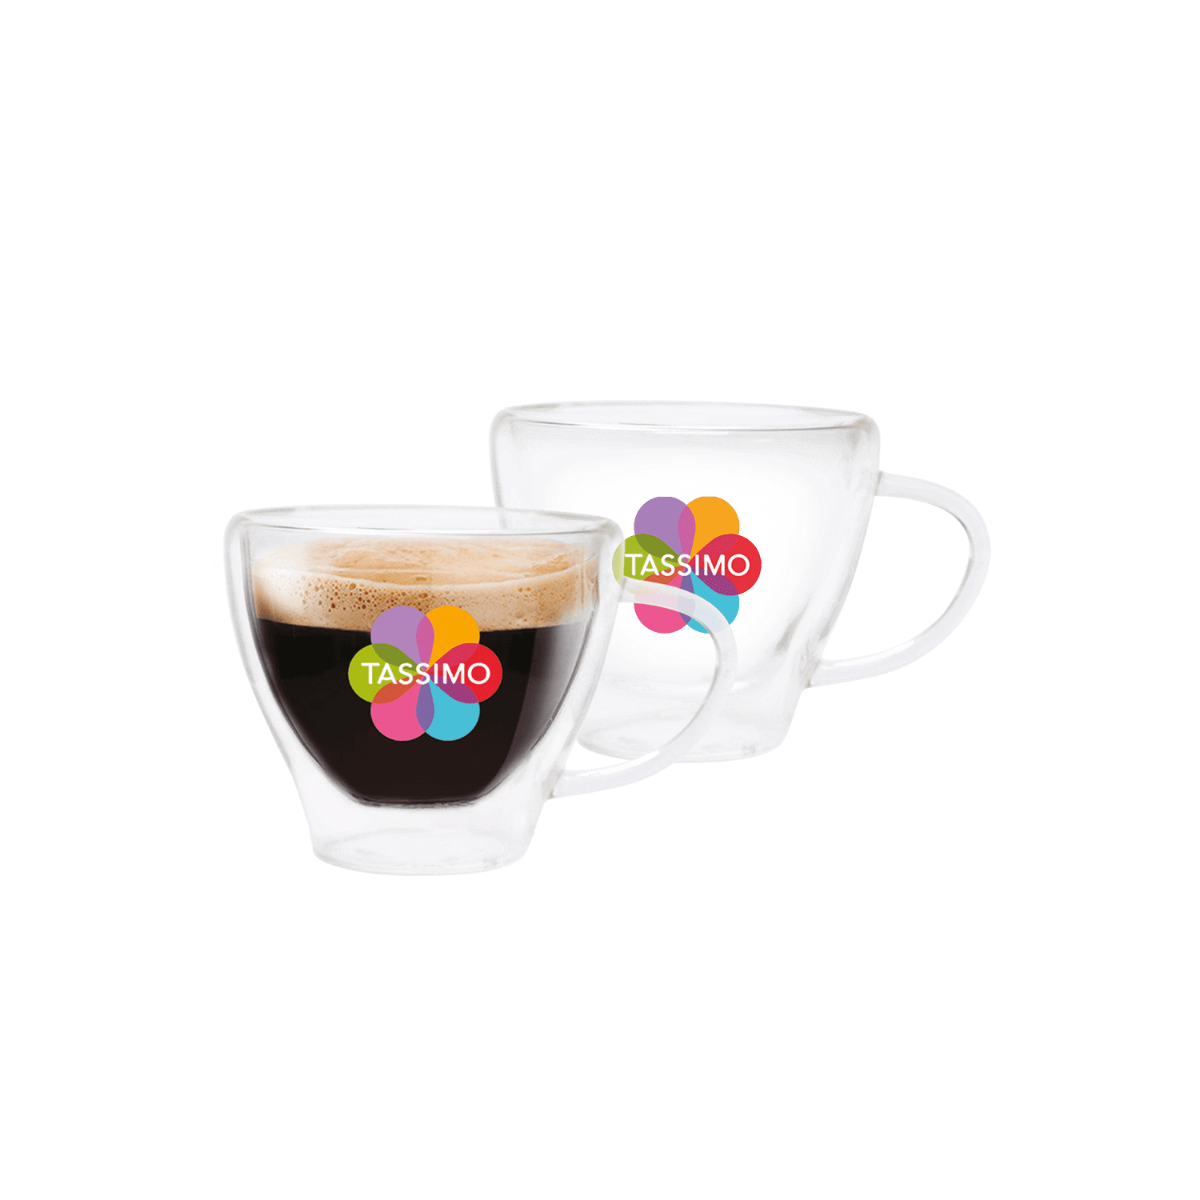 TASSIMO Espresso Glasses, pack of 2